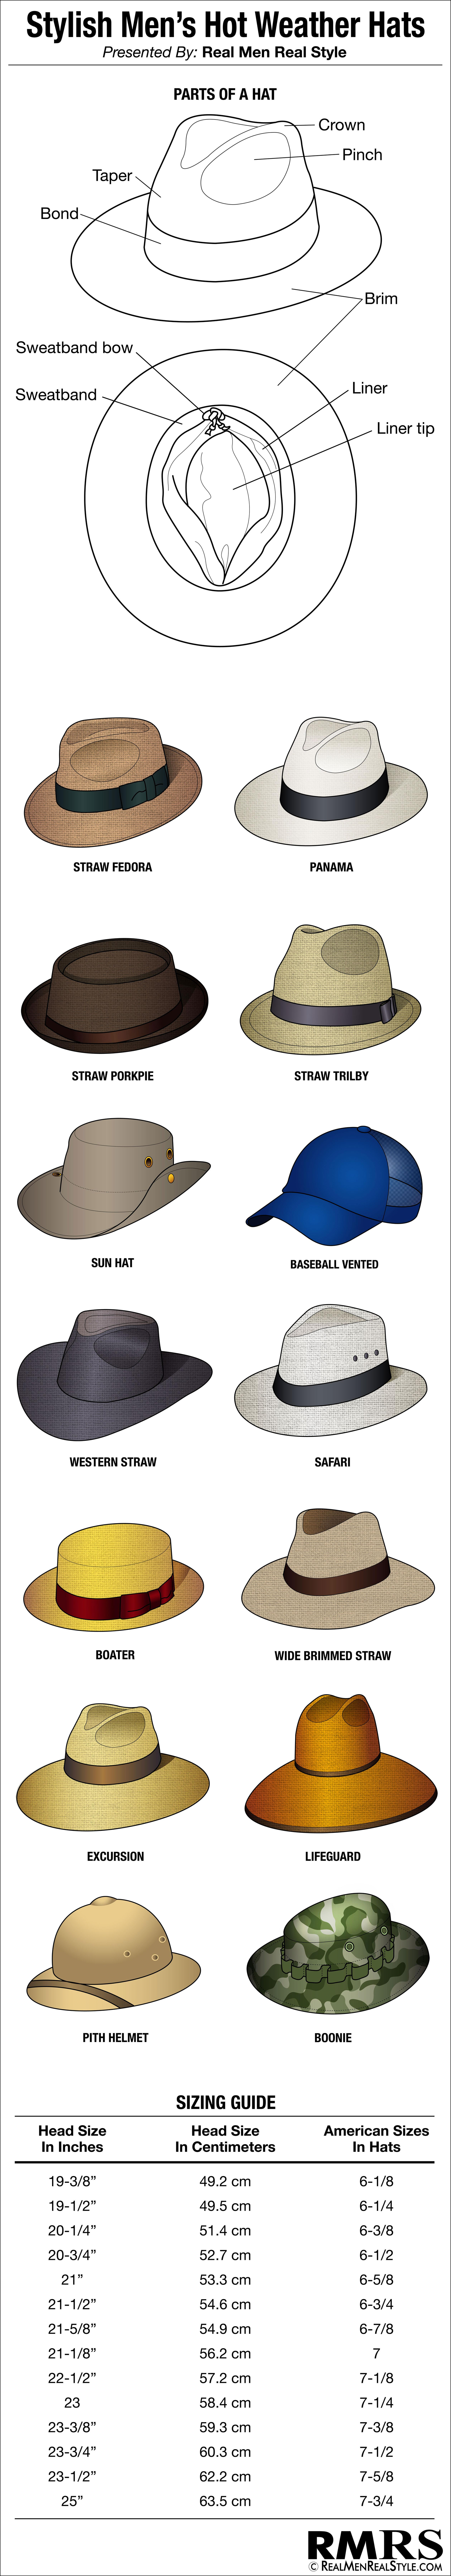 3c9d986434b Stylish Mens Hot Weather Hat | Wear | Hats for men, Mens fashion:__ ...